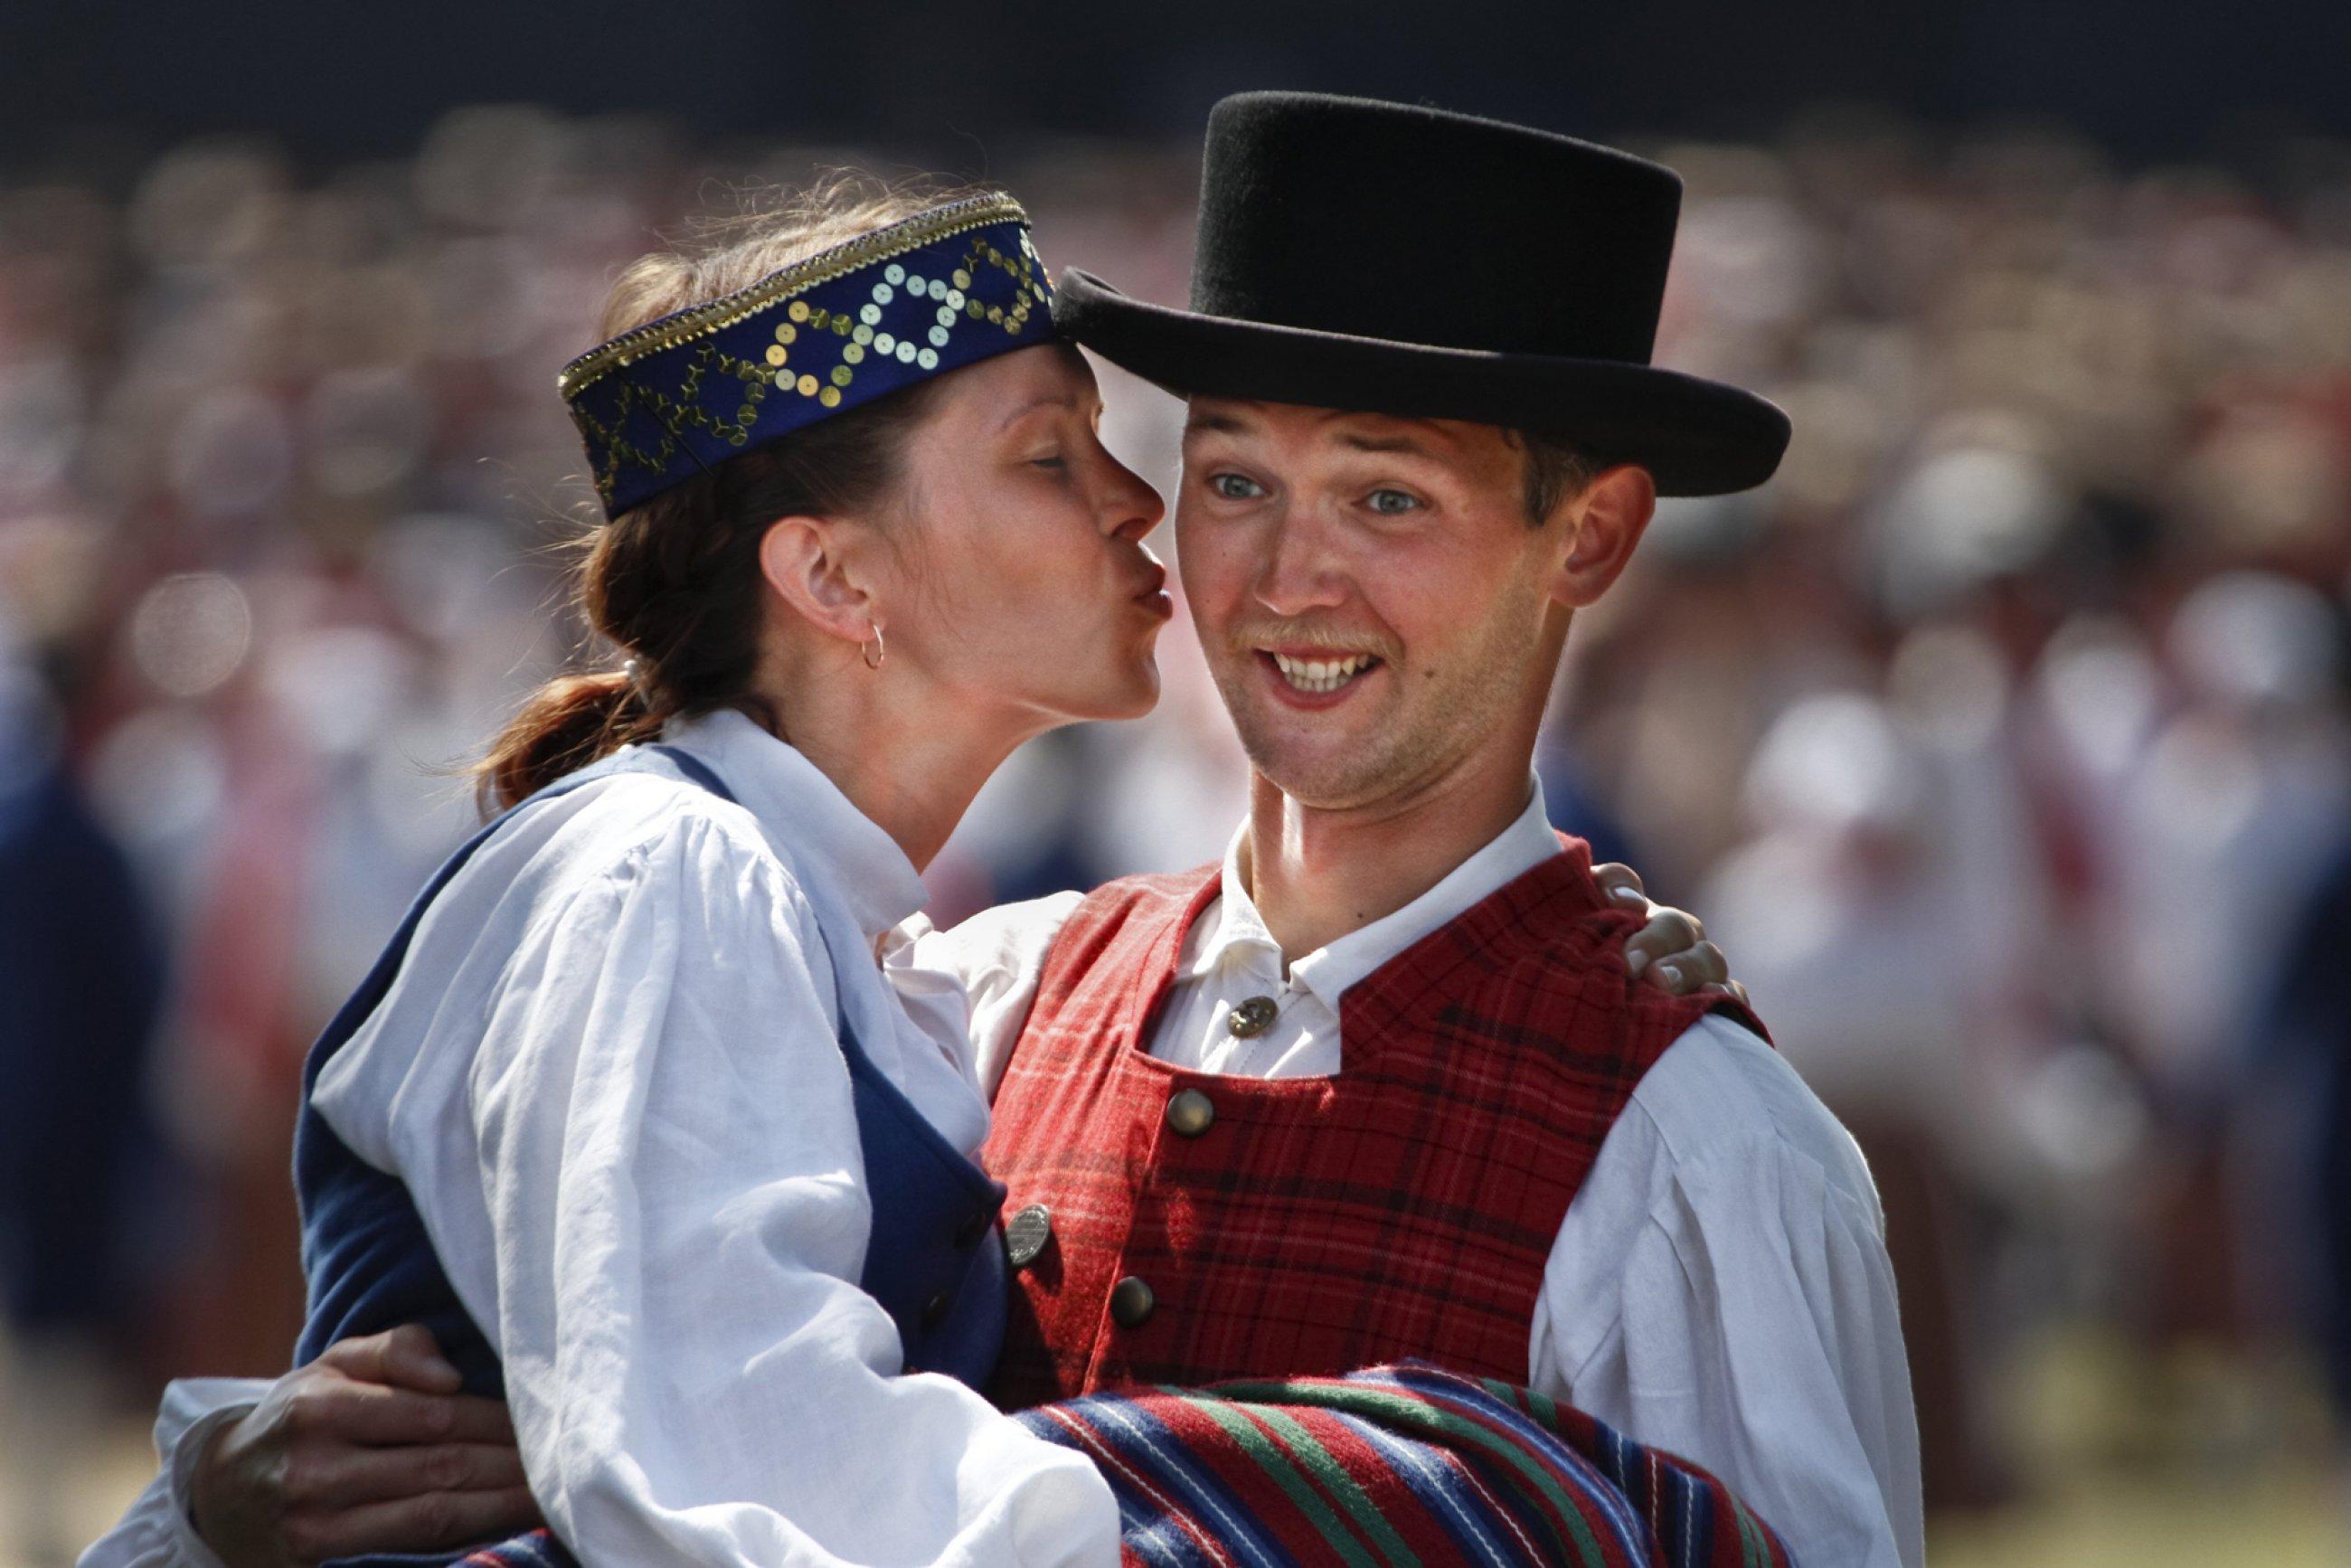 https://bubo.sk/uploads/galleries/7342/estonsko-a-kiss-at-the-dance-festival-visitestonia.jpg